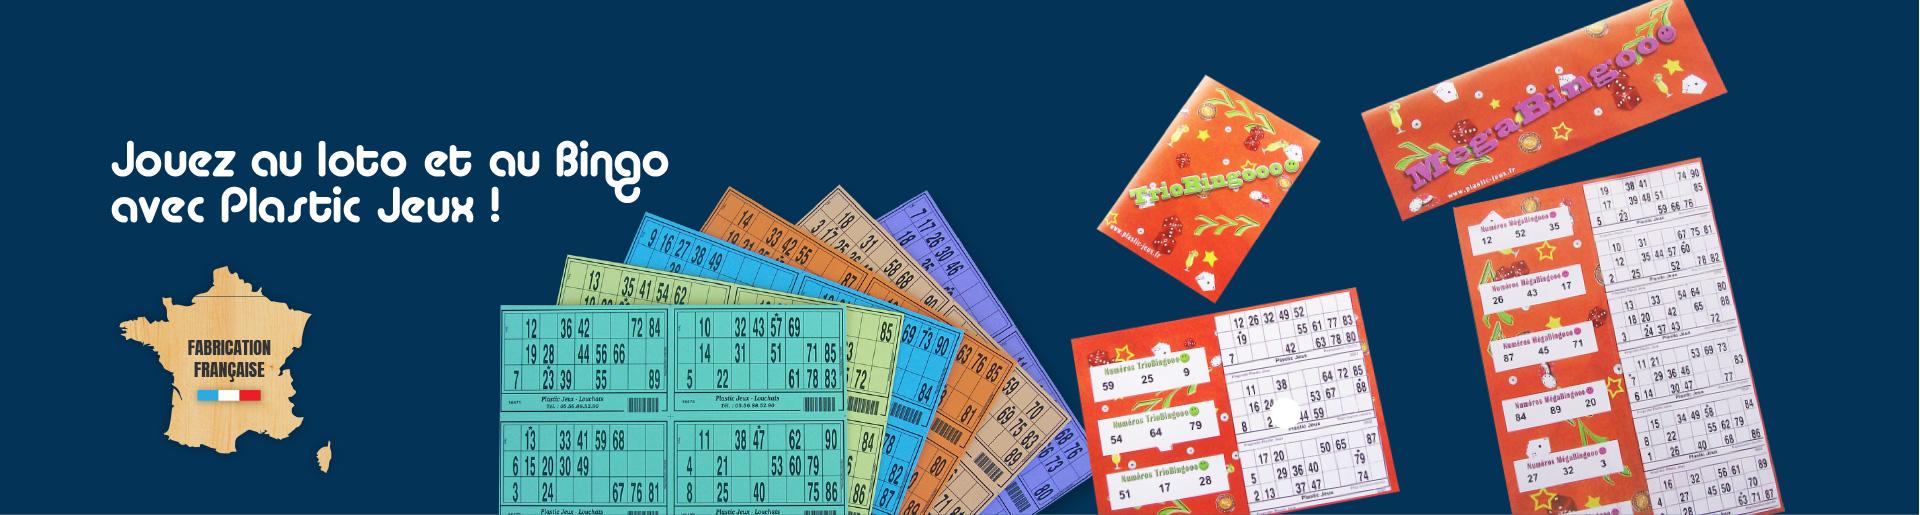 carton de loto, cartons de loto, jetons de loto, plaque de bingo, boulier de loto